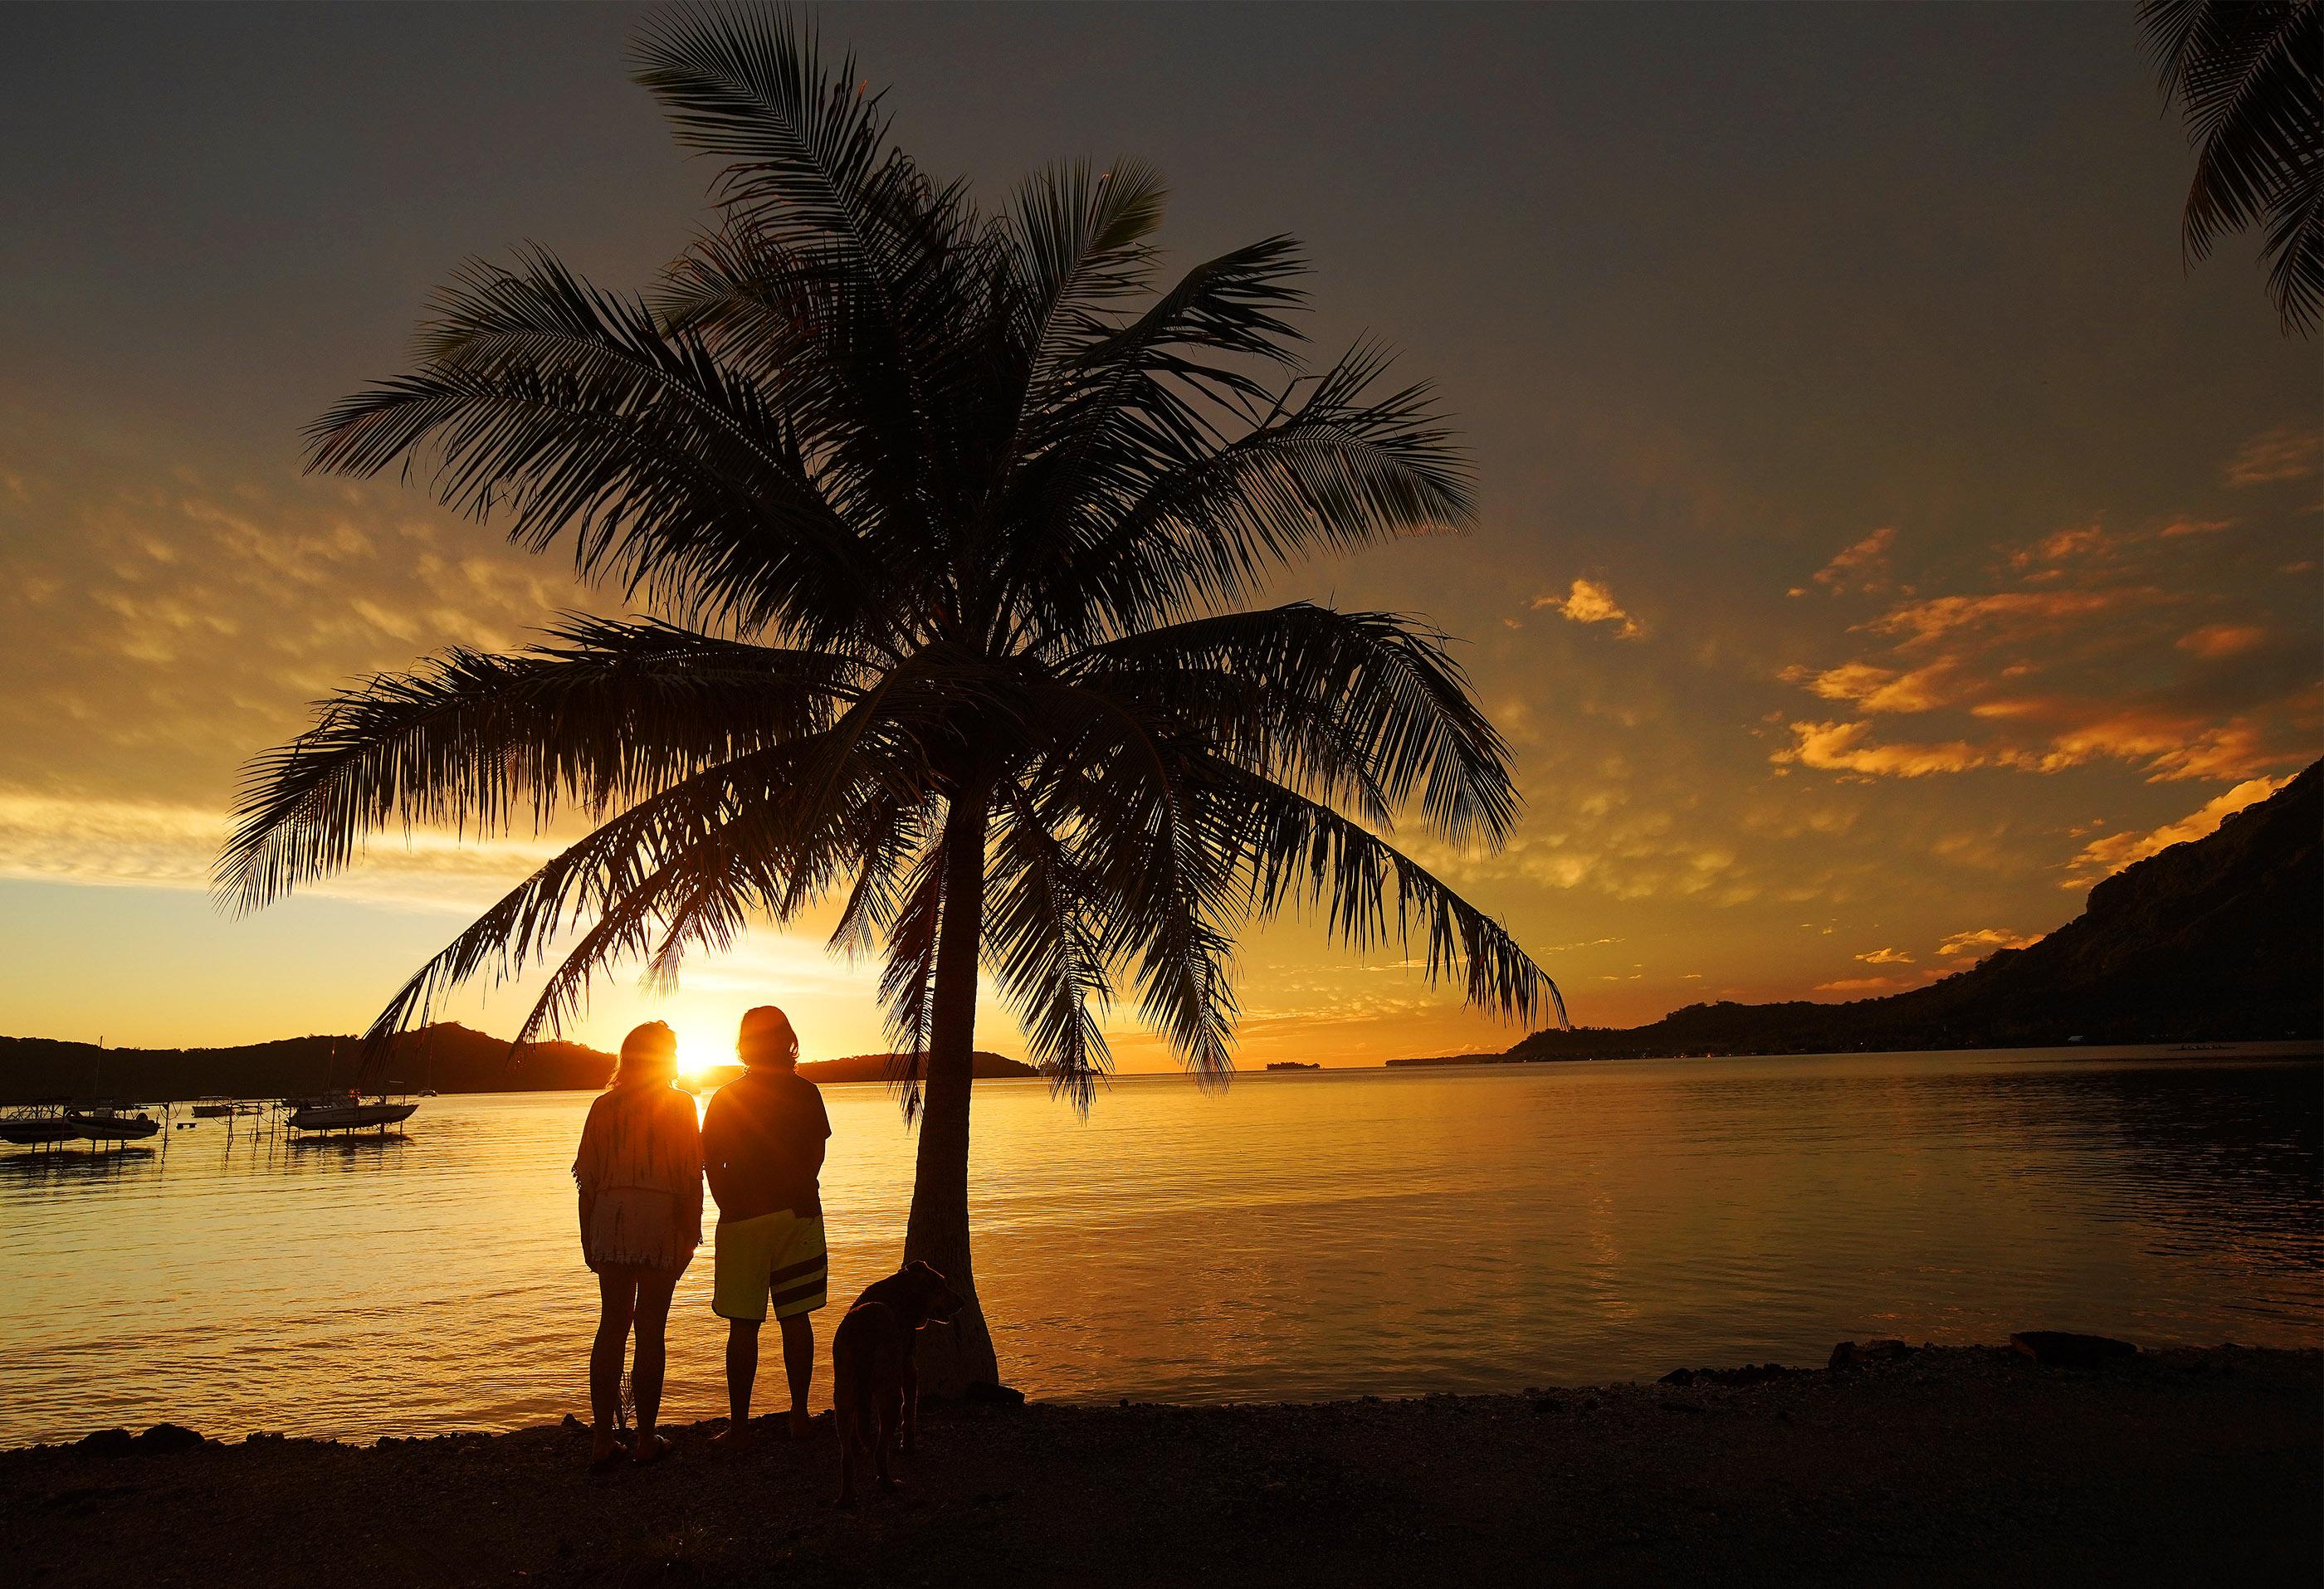 A couple watch the setting sun in Bora Bora on May 28, 2019.